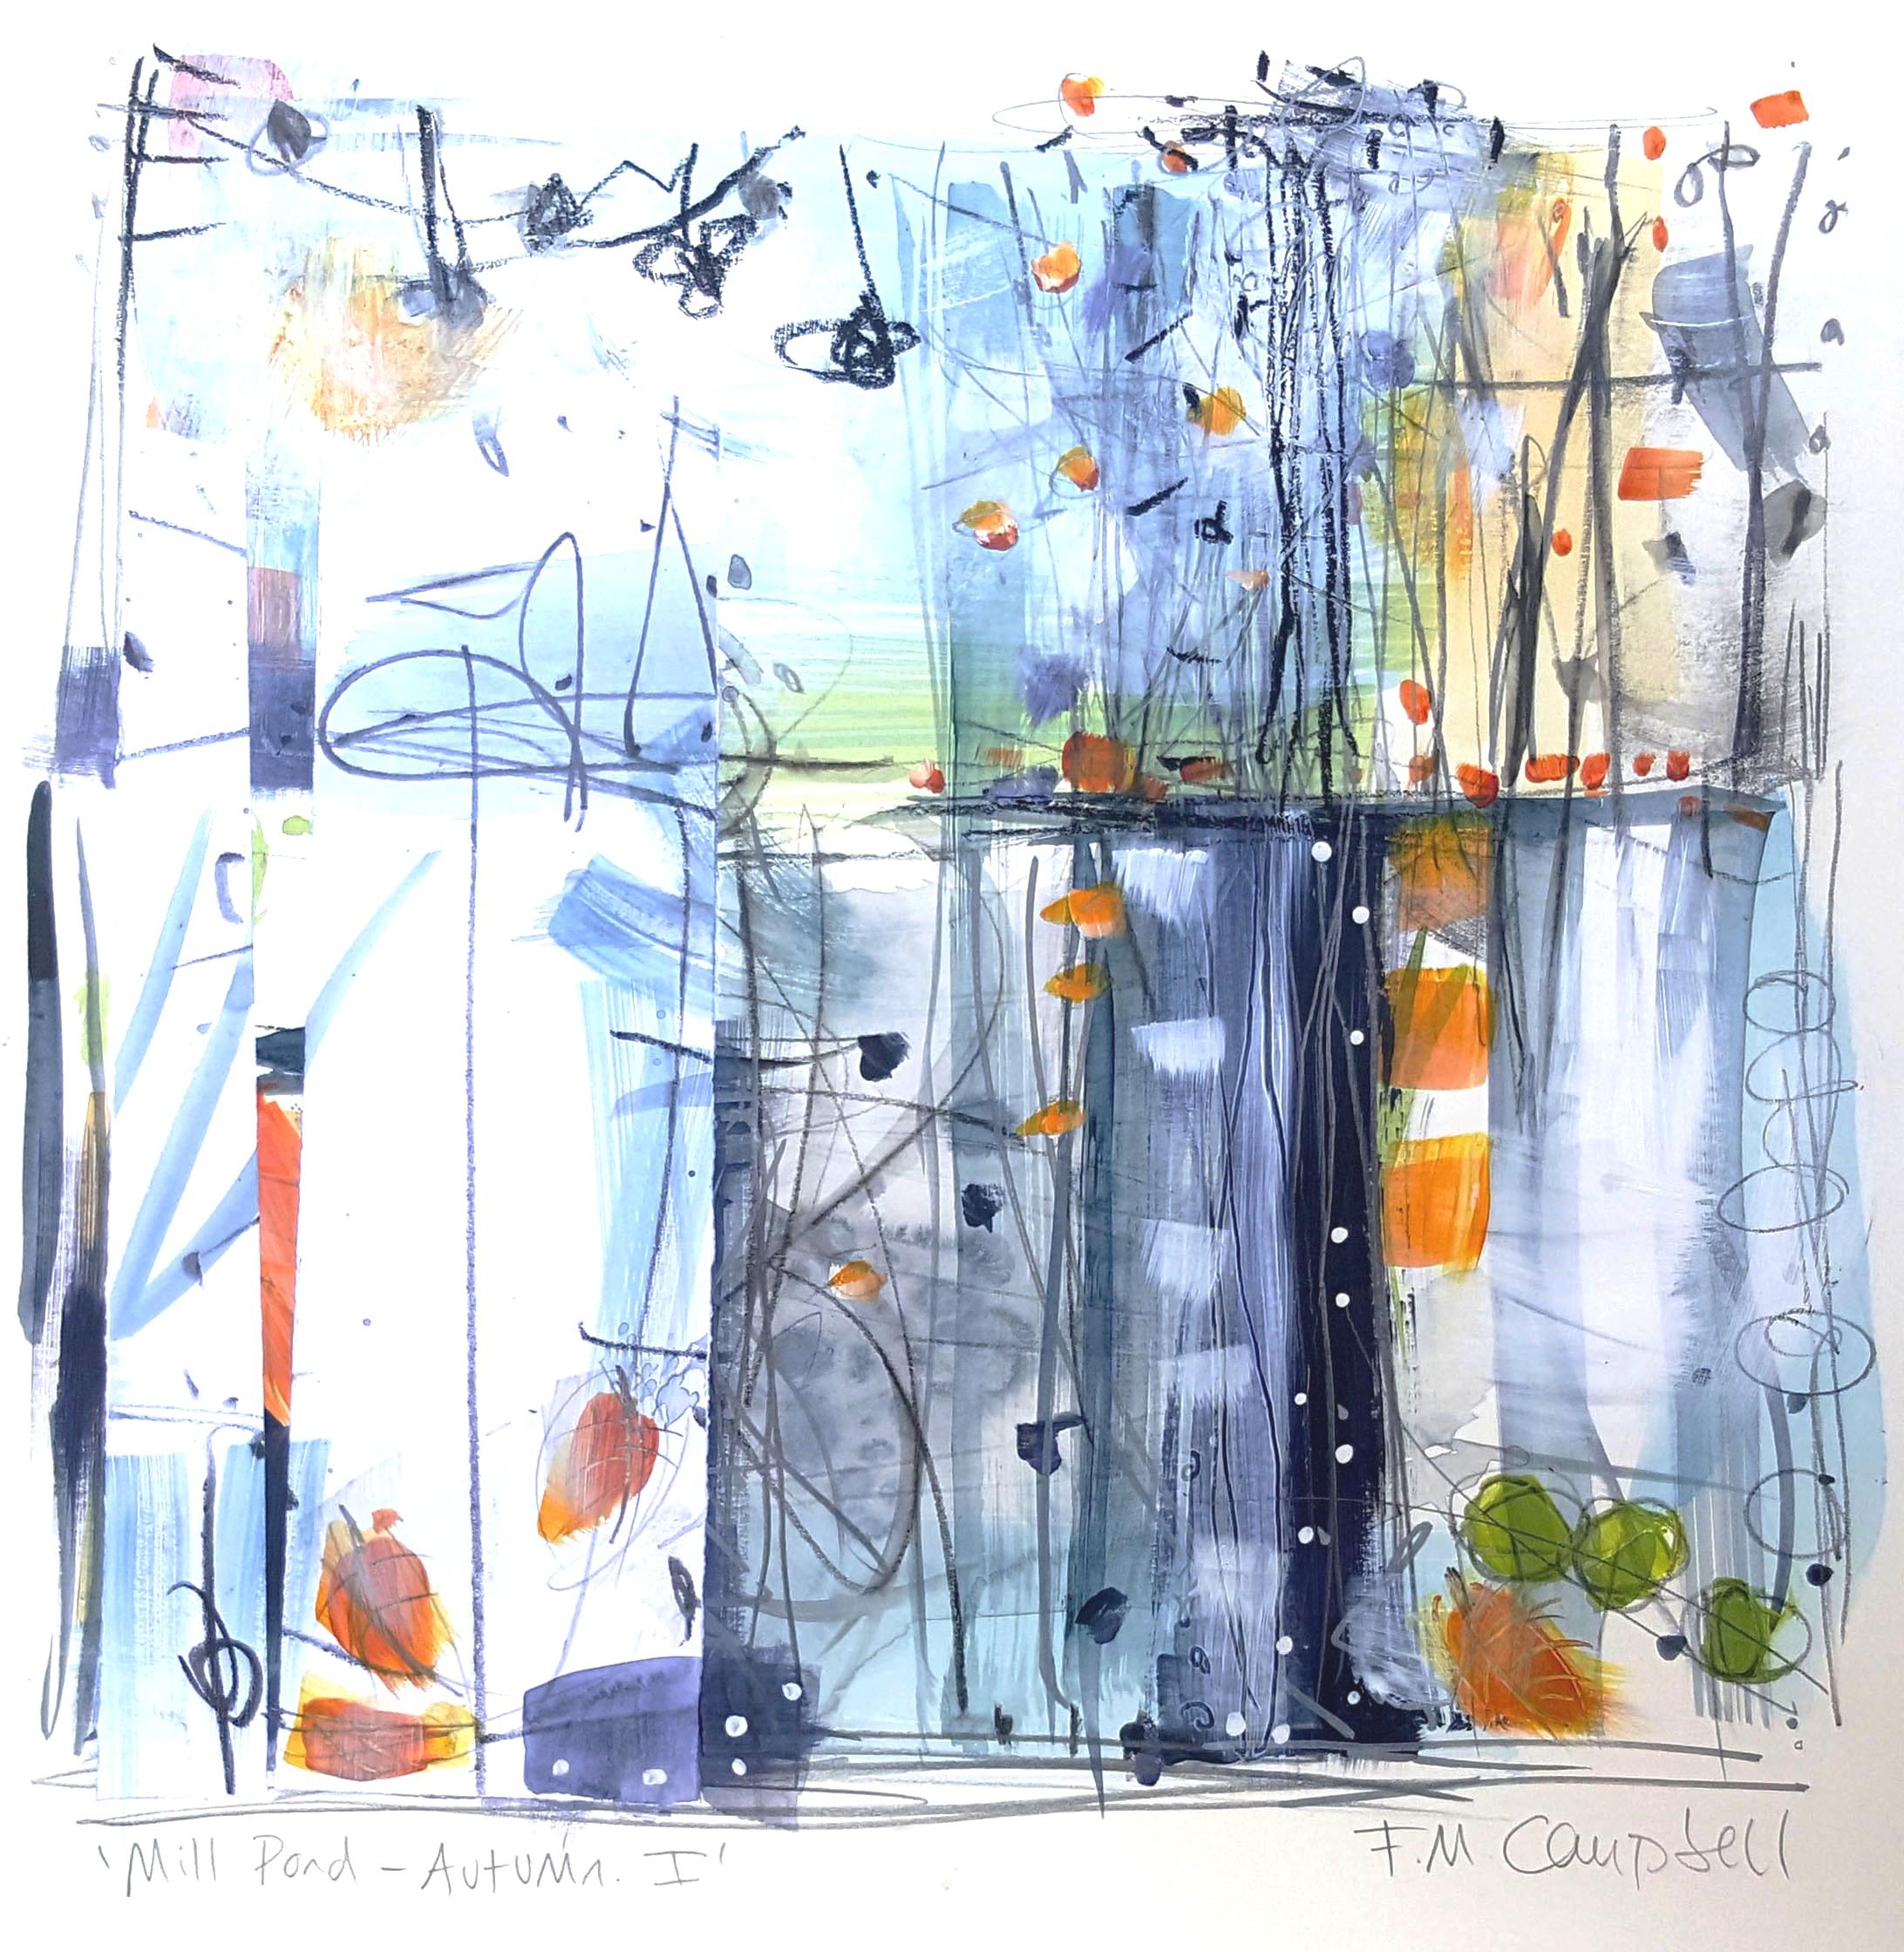 'Mill Pond - Autumn I'